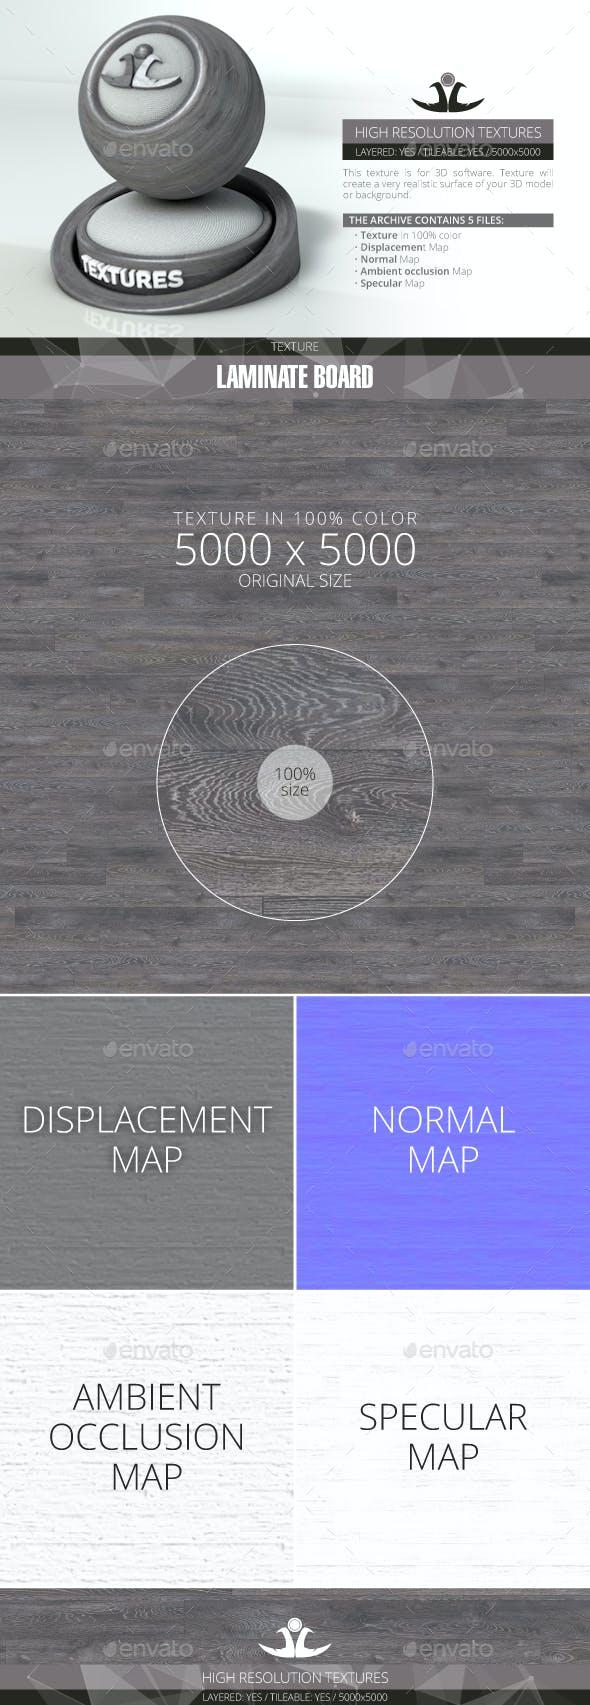 Laminate Board 50 - 3DOcean Item for Sale